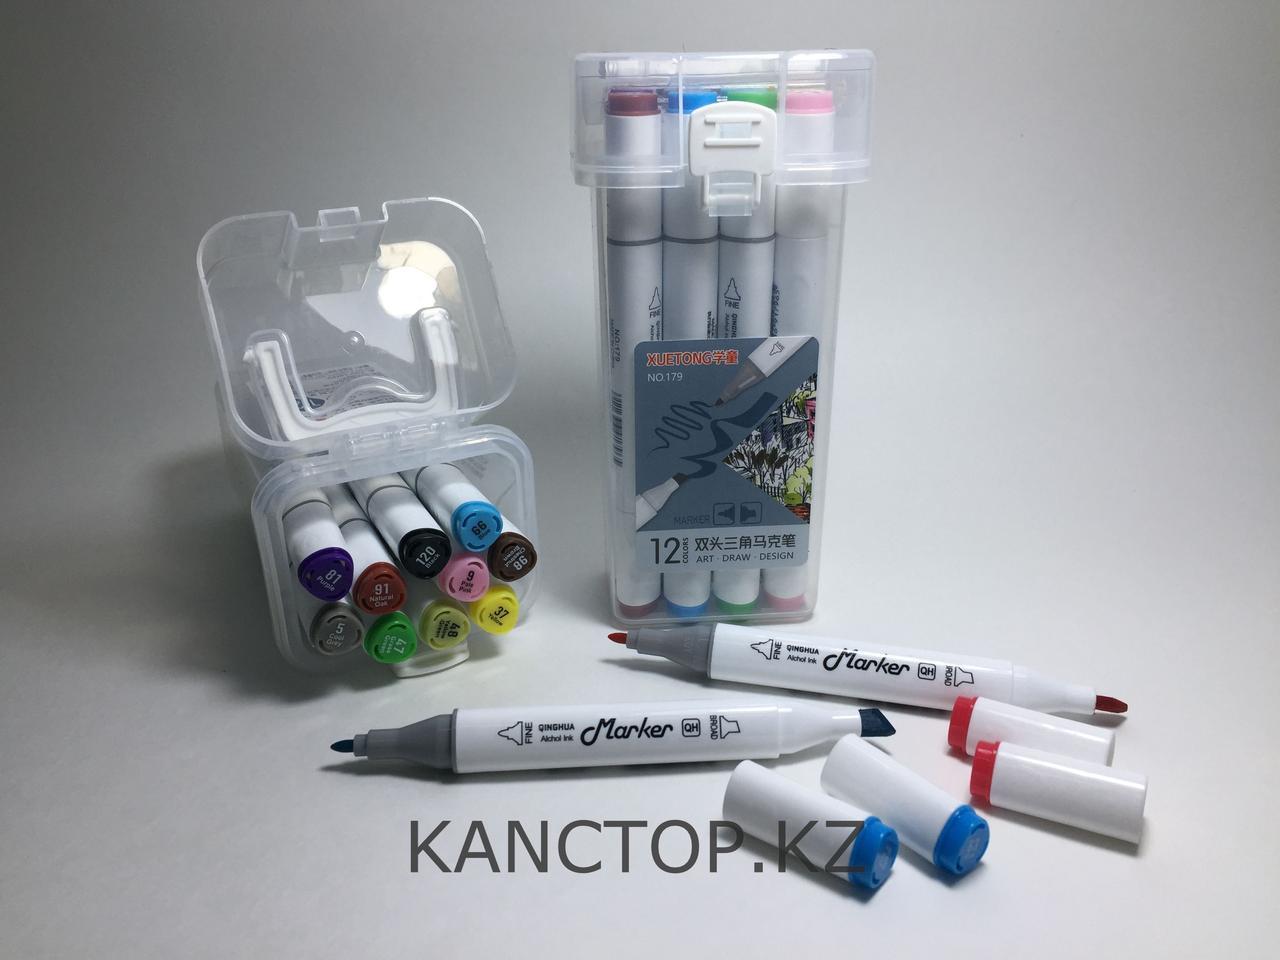 Маркеры Touch (тачмаркеры) толстые двусторонние Xuetong, 12 цветов